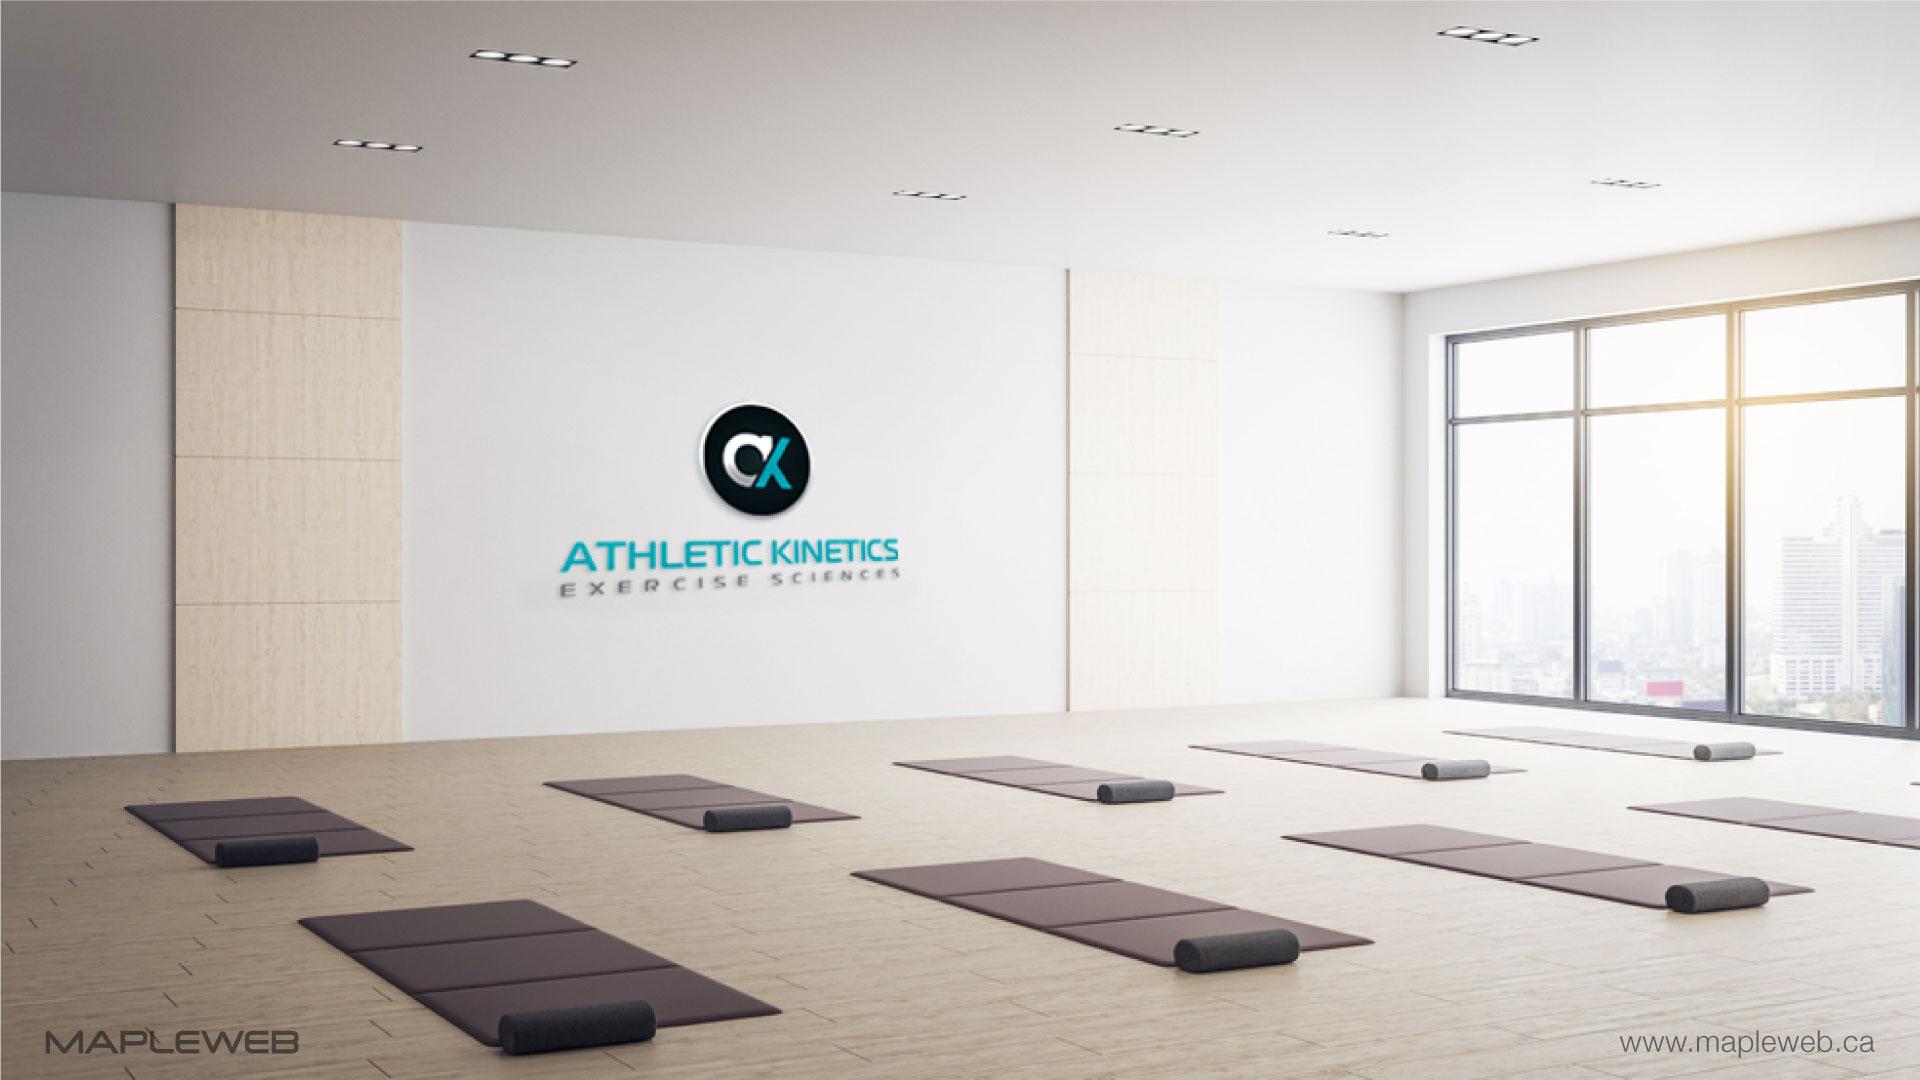 athletic-kinetics-brand-logo-design-by-mapleweb-vancouver-canada-wall-mock